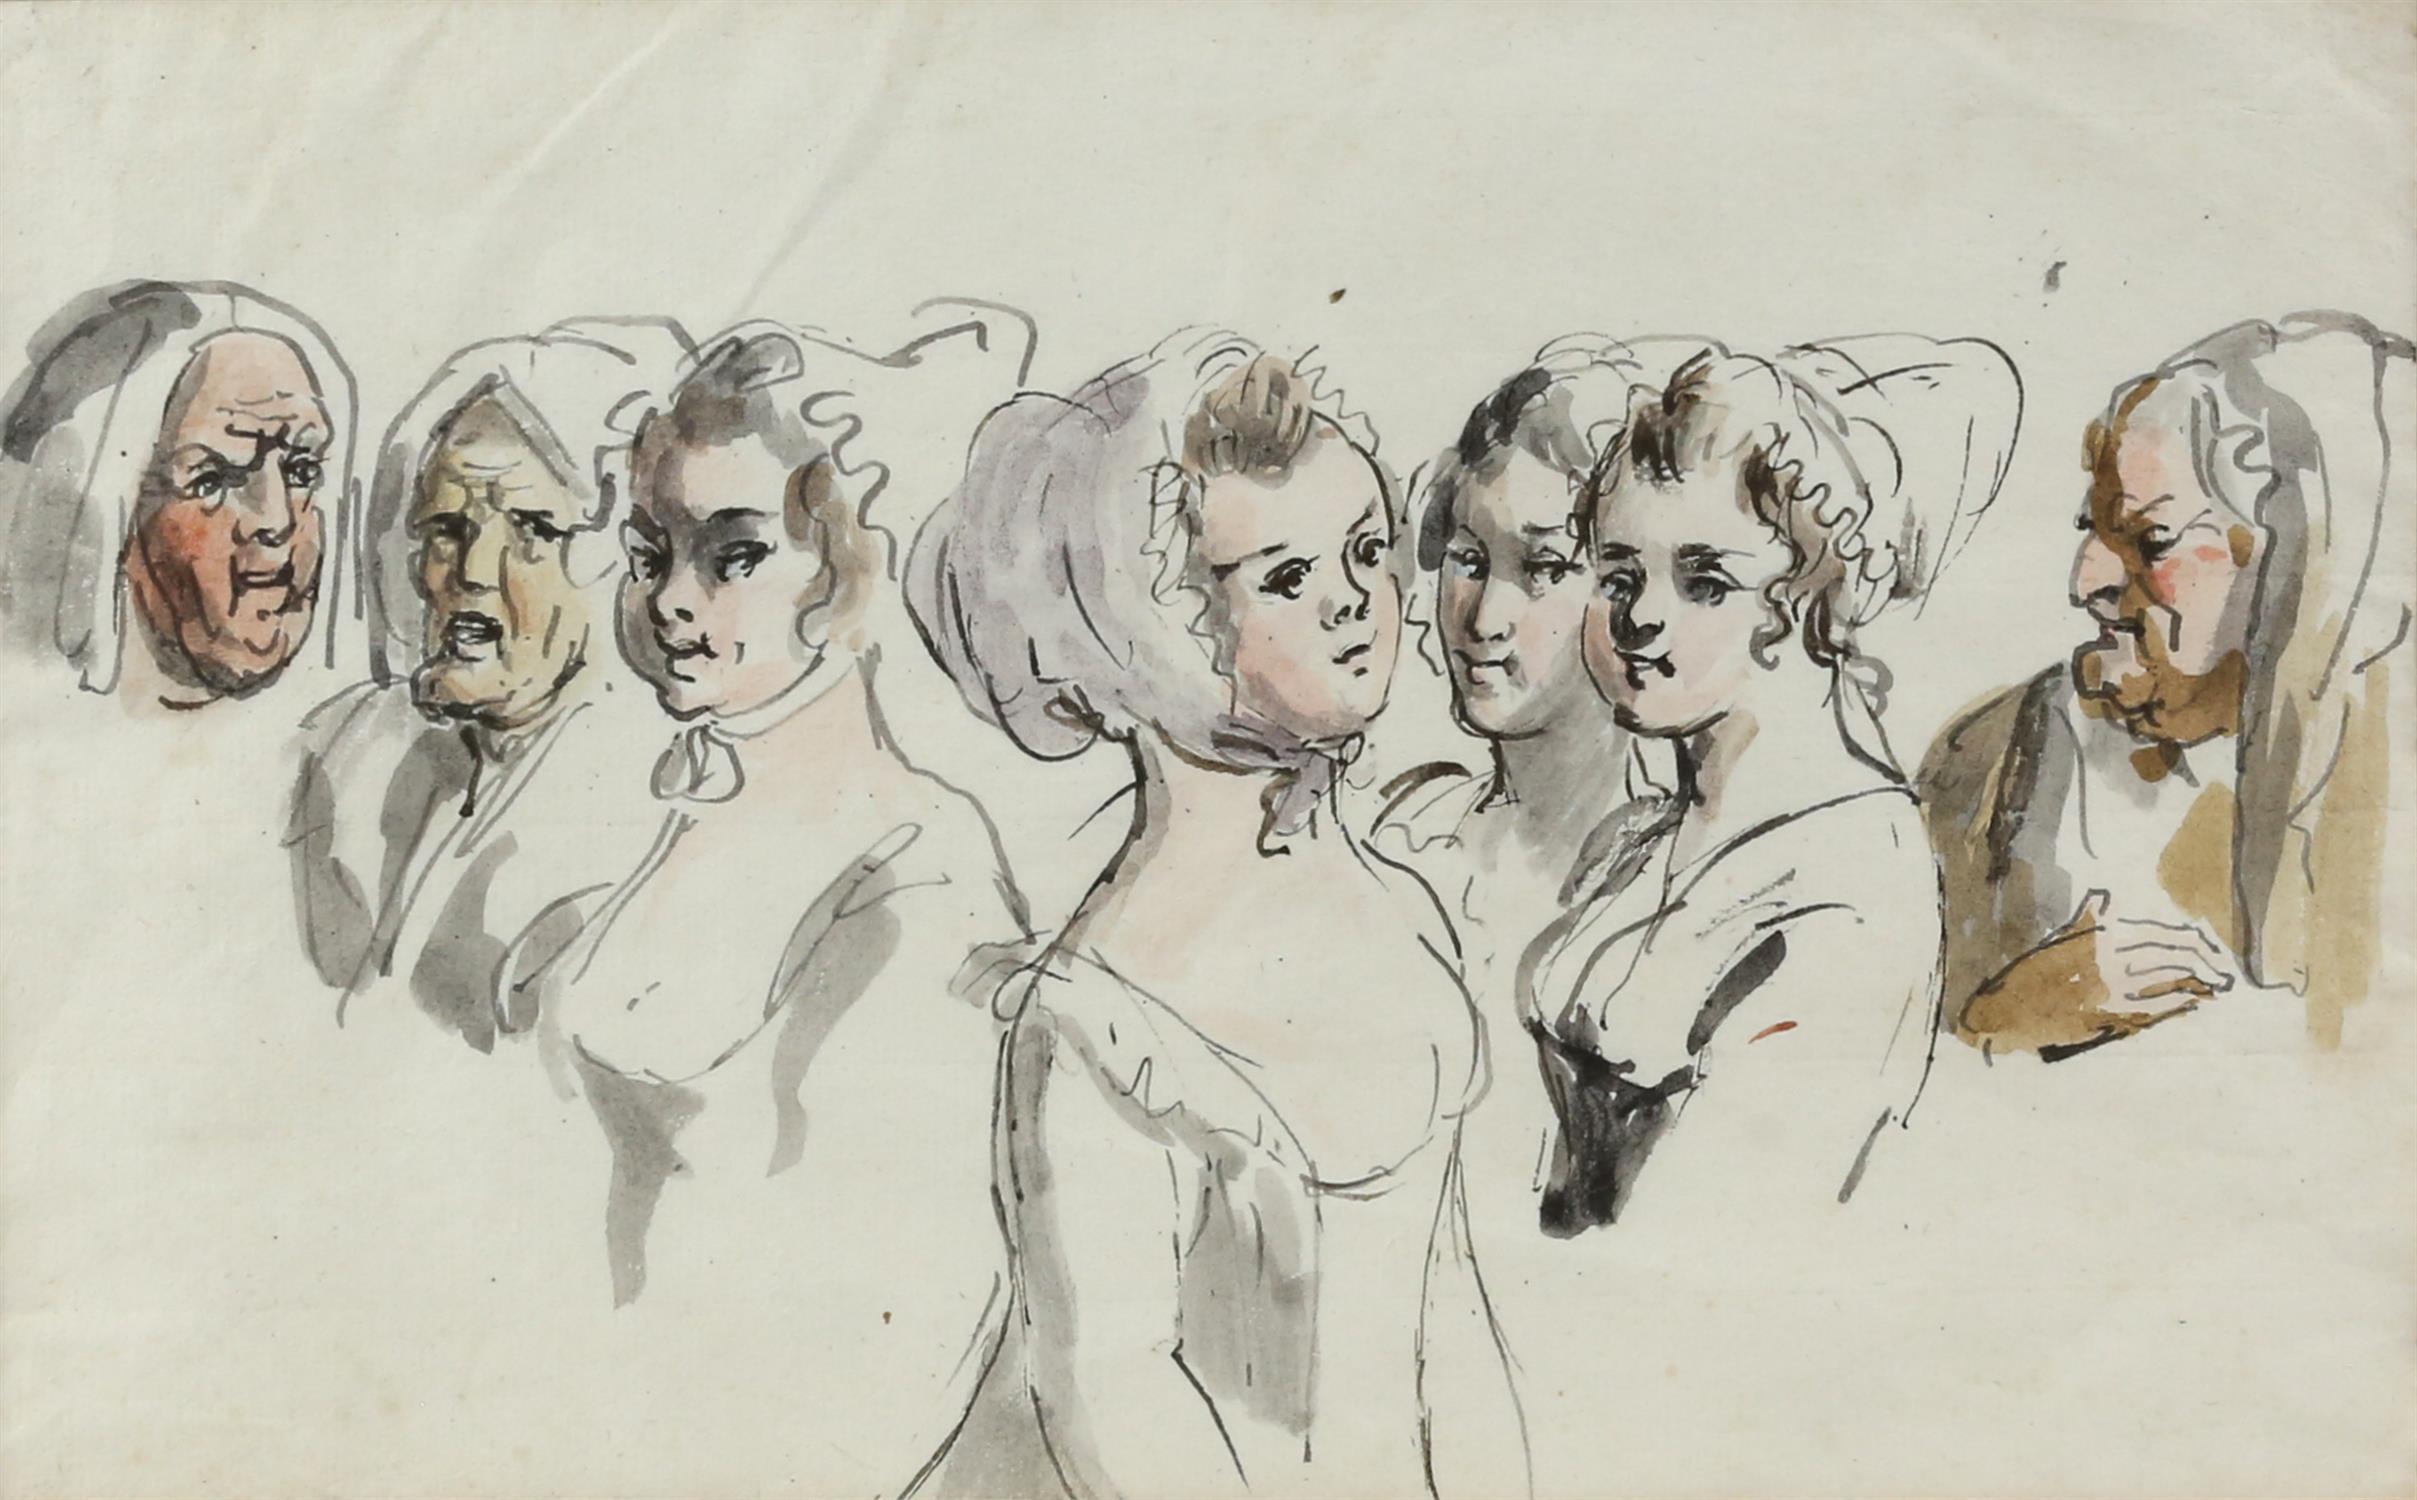 19th century Continental School, seven head studies of ladies, ink and watercolour, 16.5cm x 26.5cm,